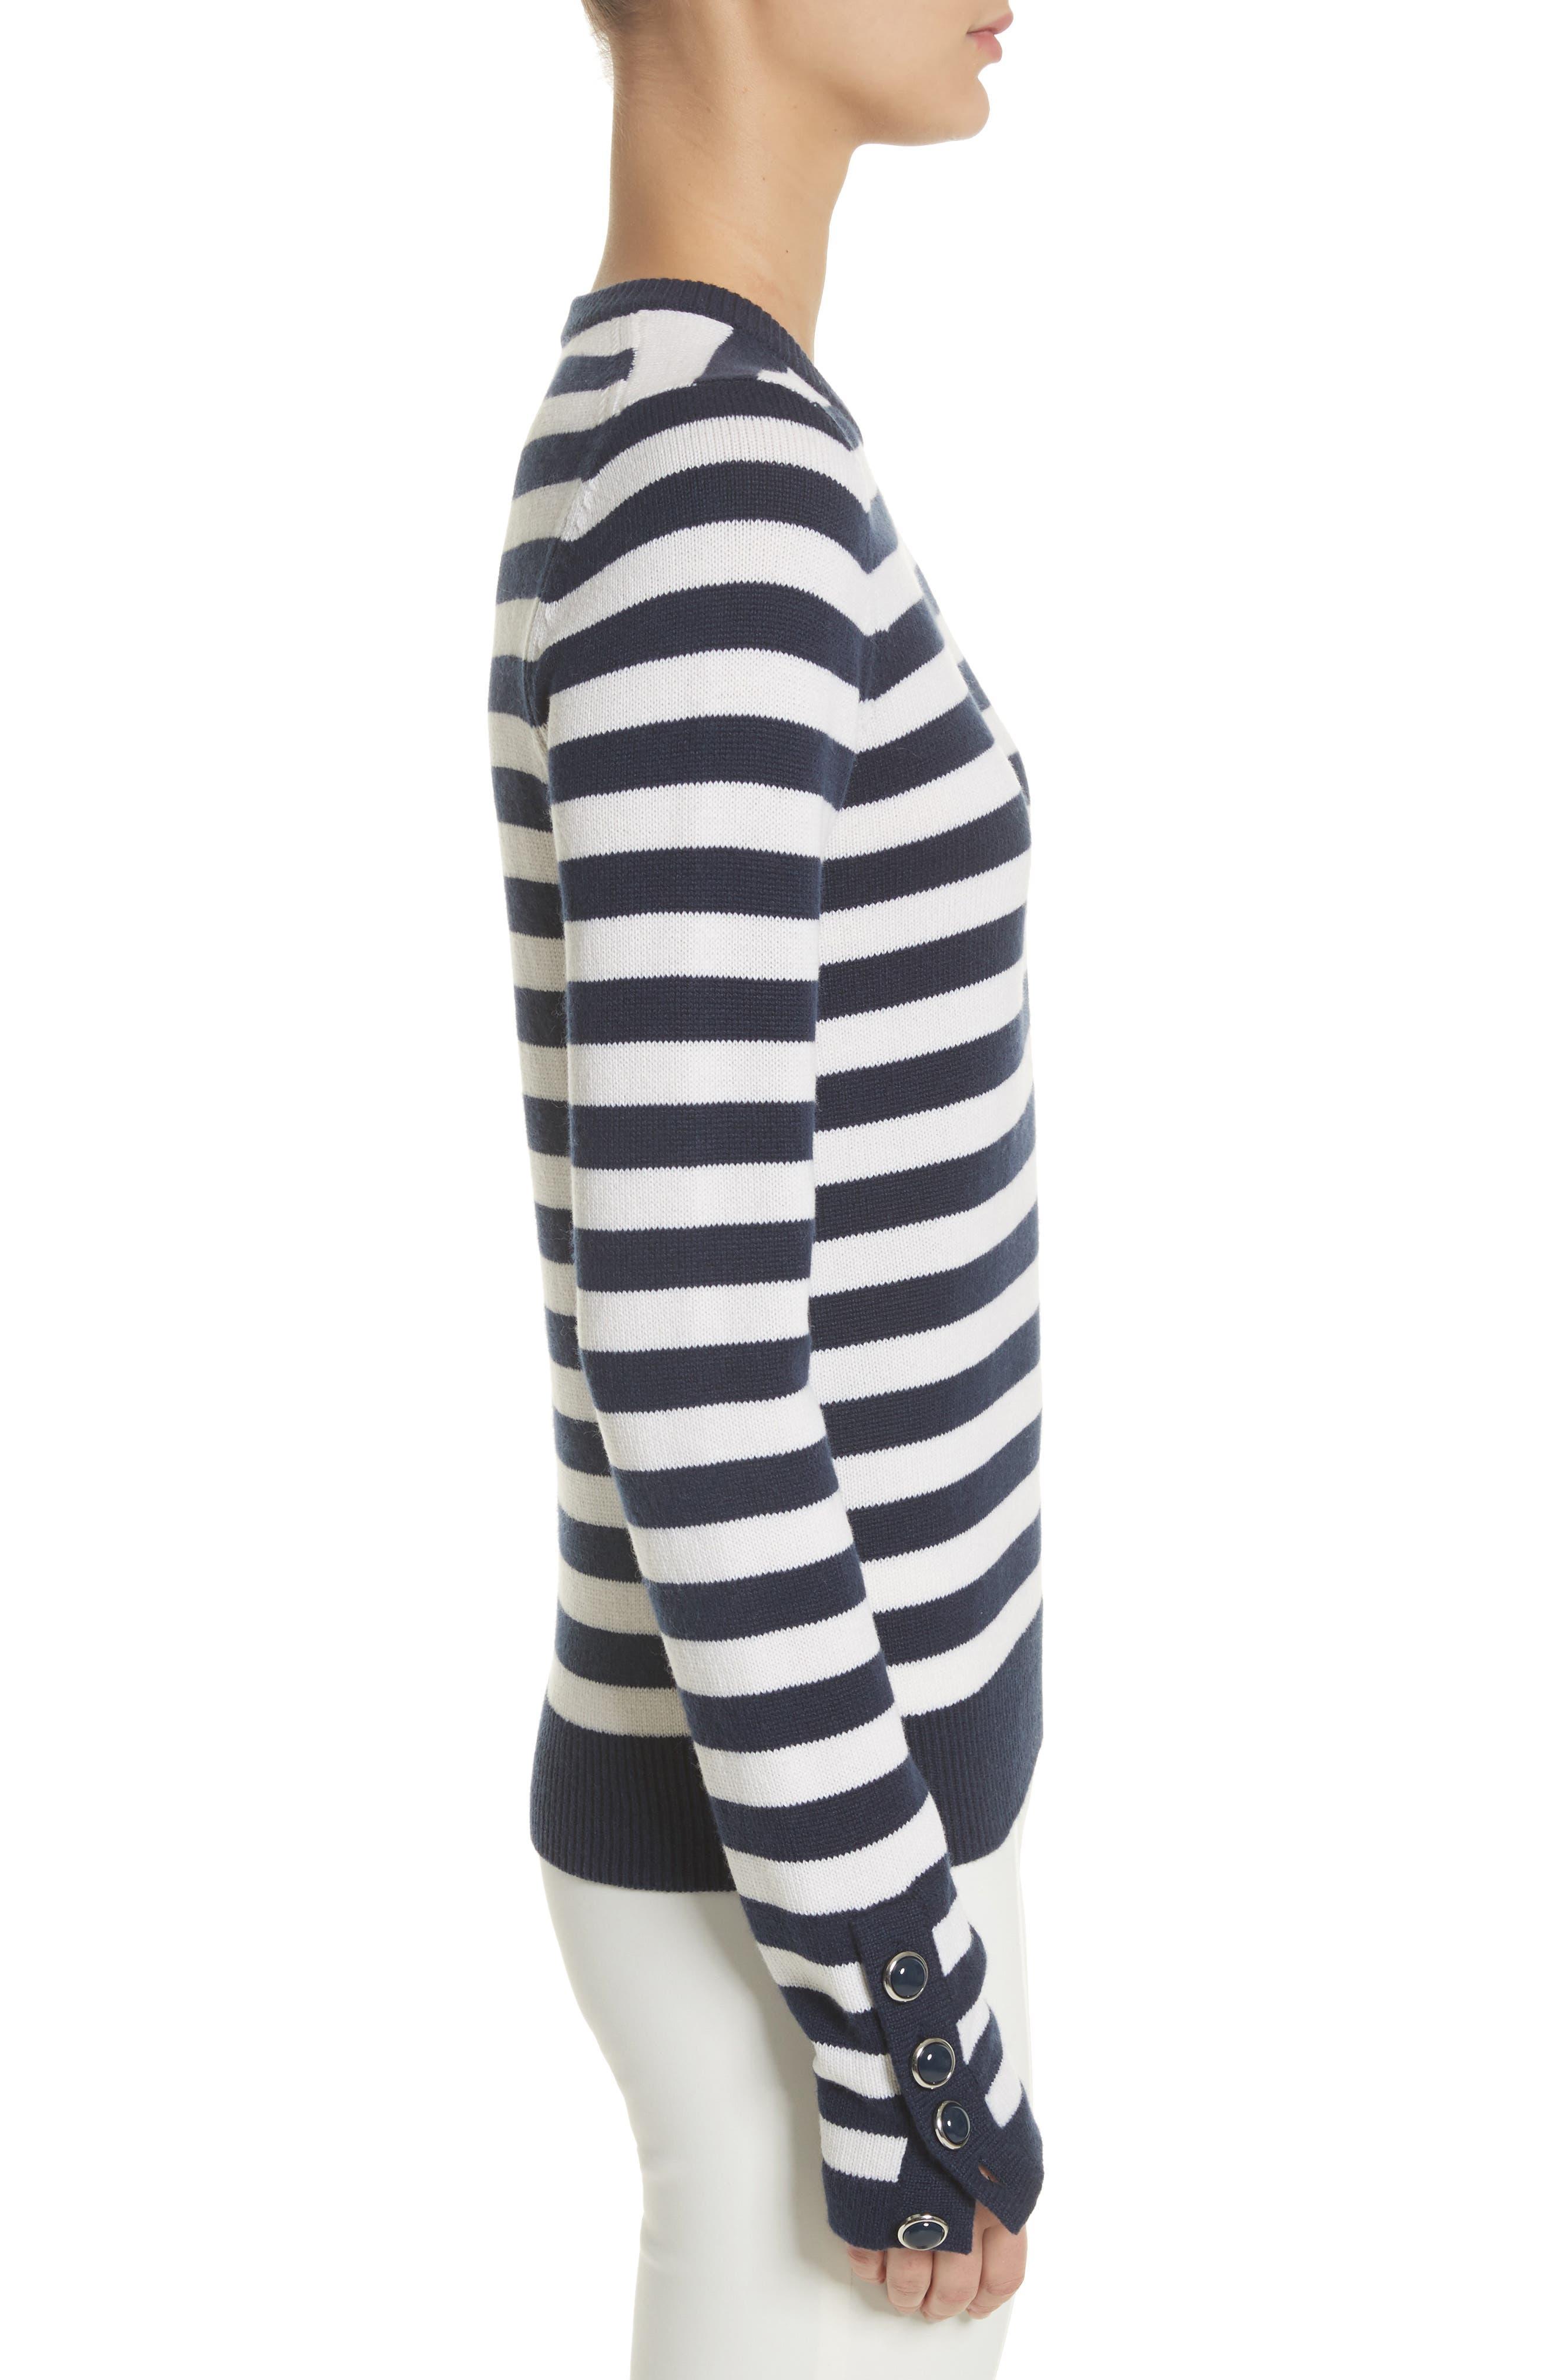 Alternate Image 3  - Michael Kors Button Cuff Cashmere Sweater